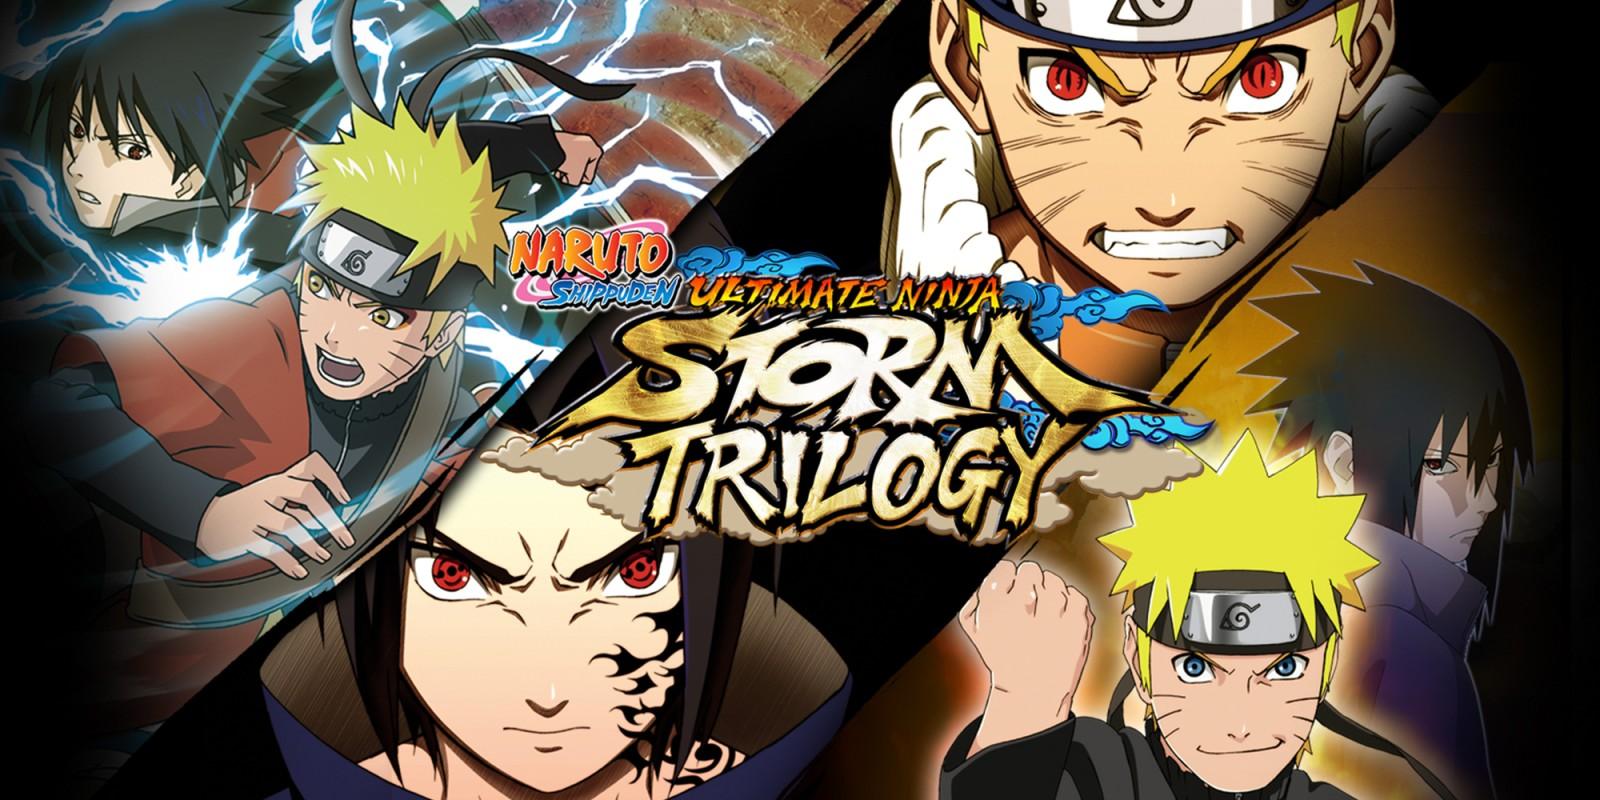 Naruto Shippuden Ultimate Ninja Storm Trilogy Jeux A Telecharger